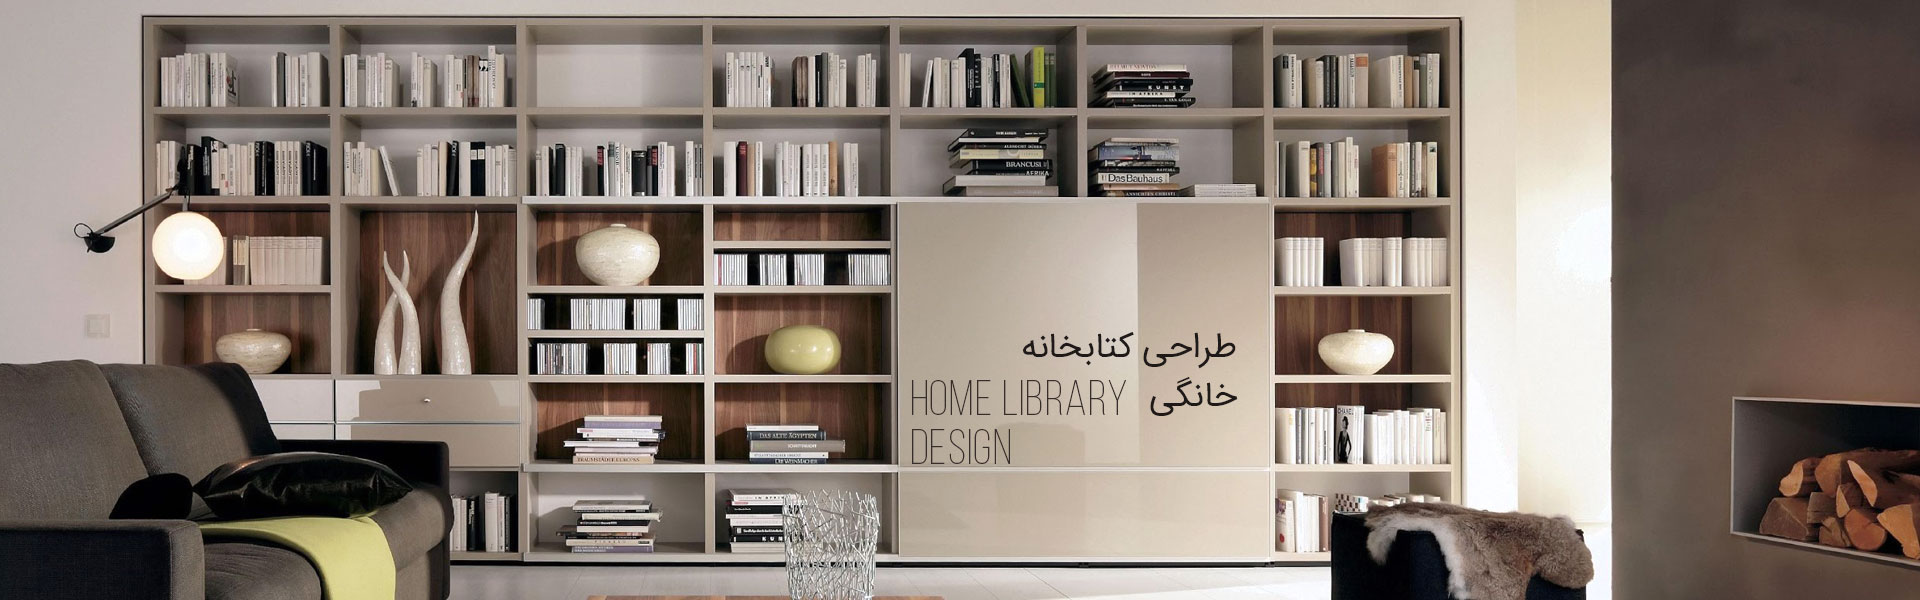 decorasion tarahi ketabkhane1 - طراحی کتابخانه خانگی